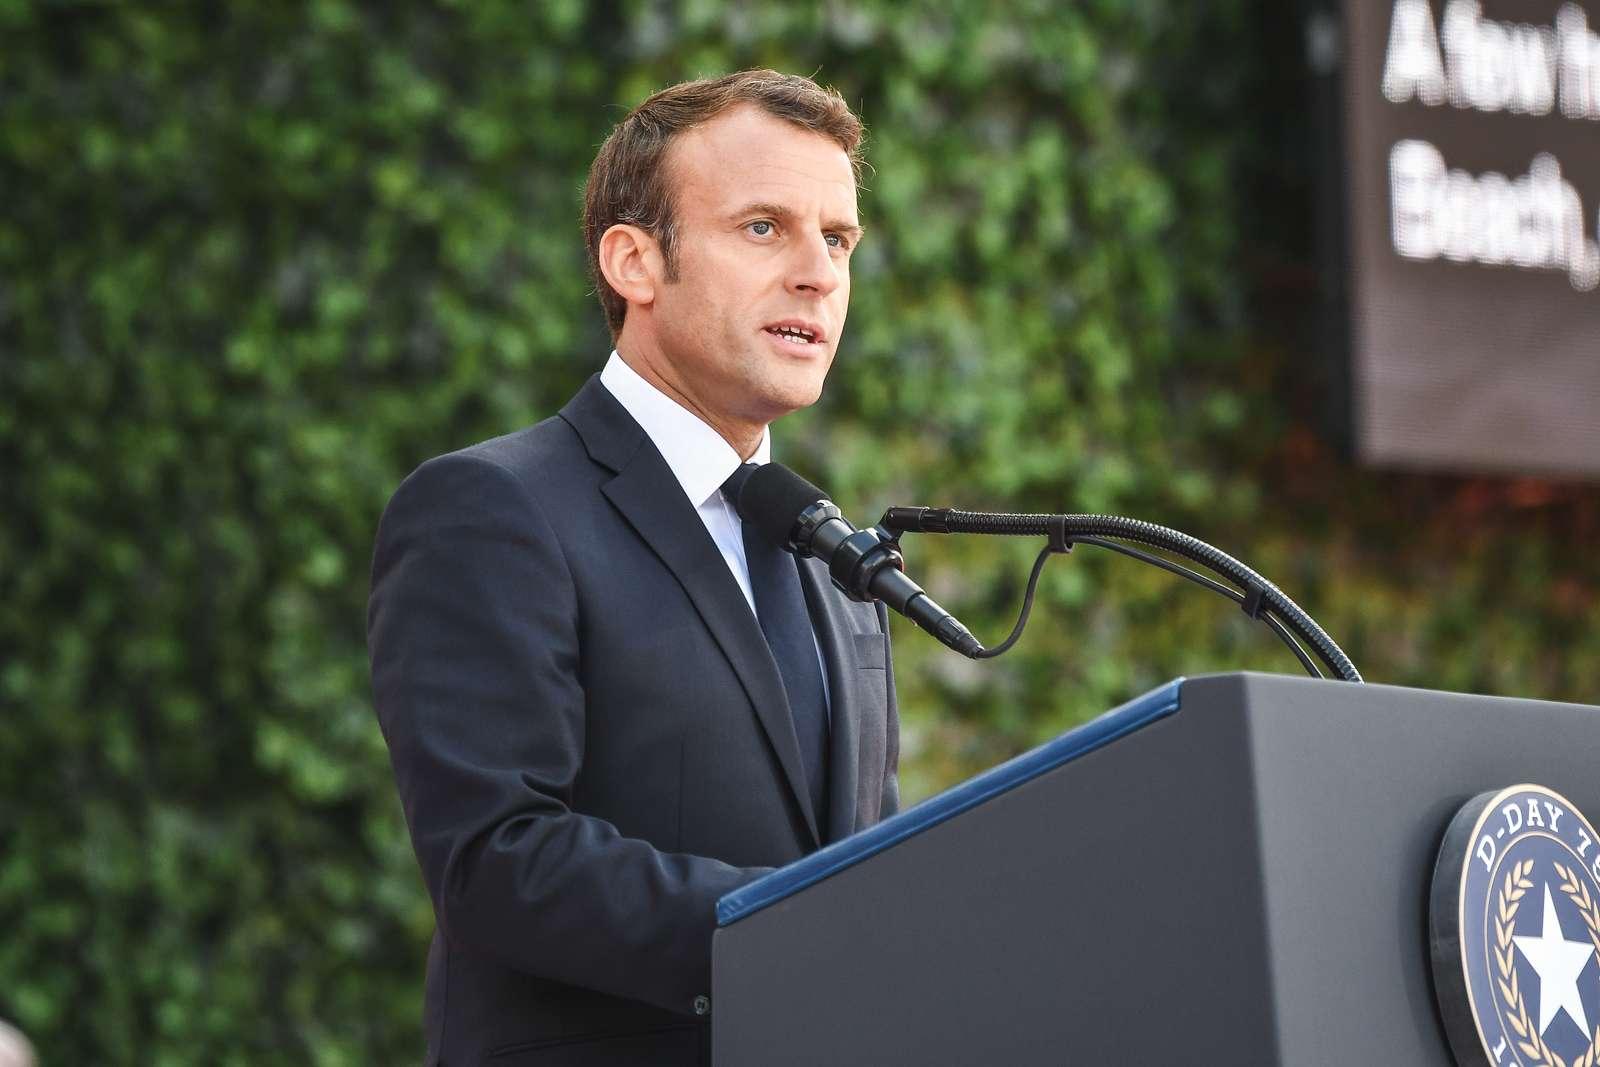 President Emmanuel Macron, the President of France, - U.S. National Archives & DVIDS Public Domain Search